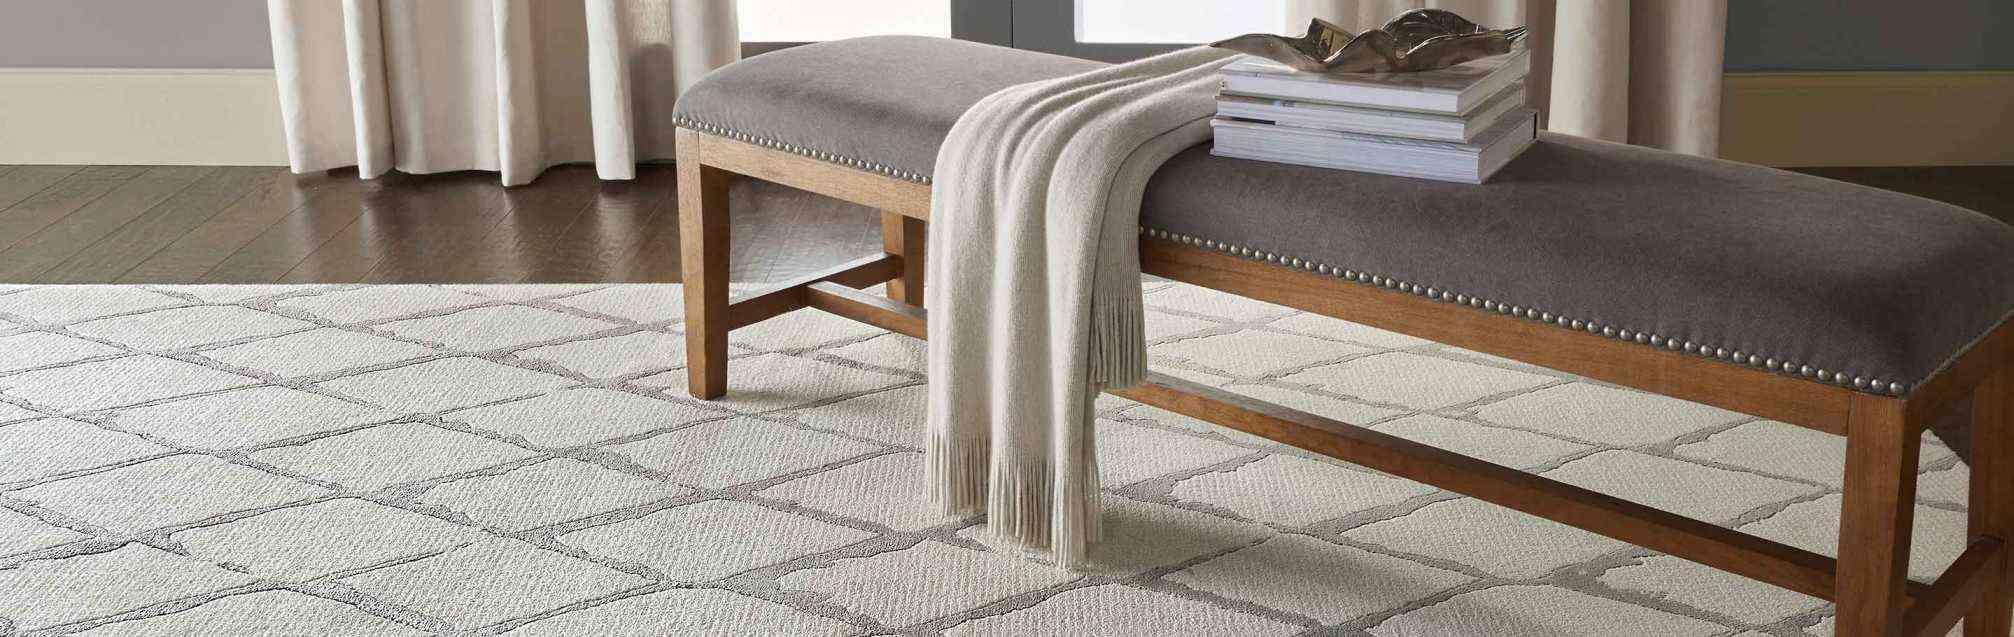 flooring south tampa fl carpet